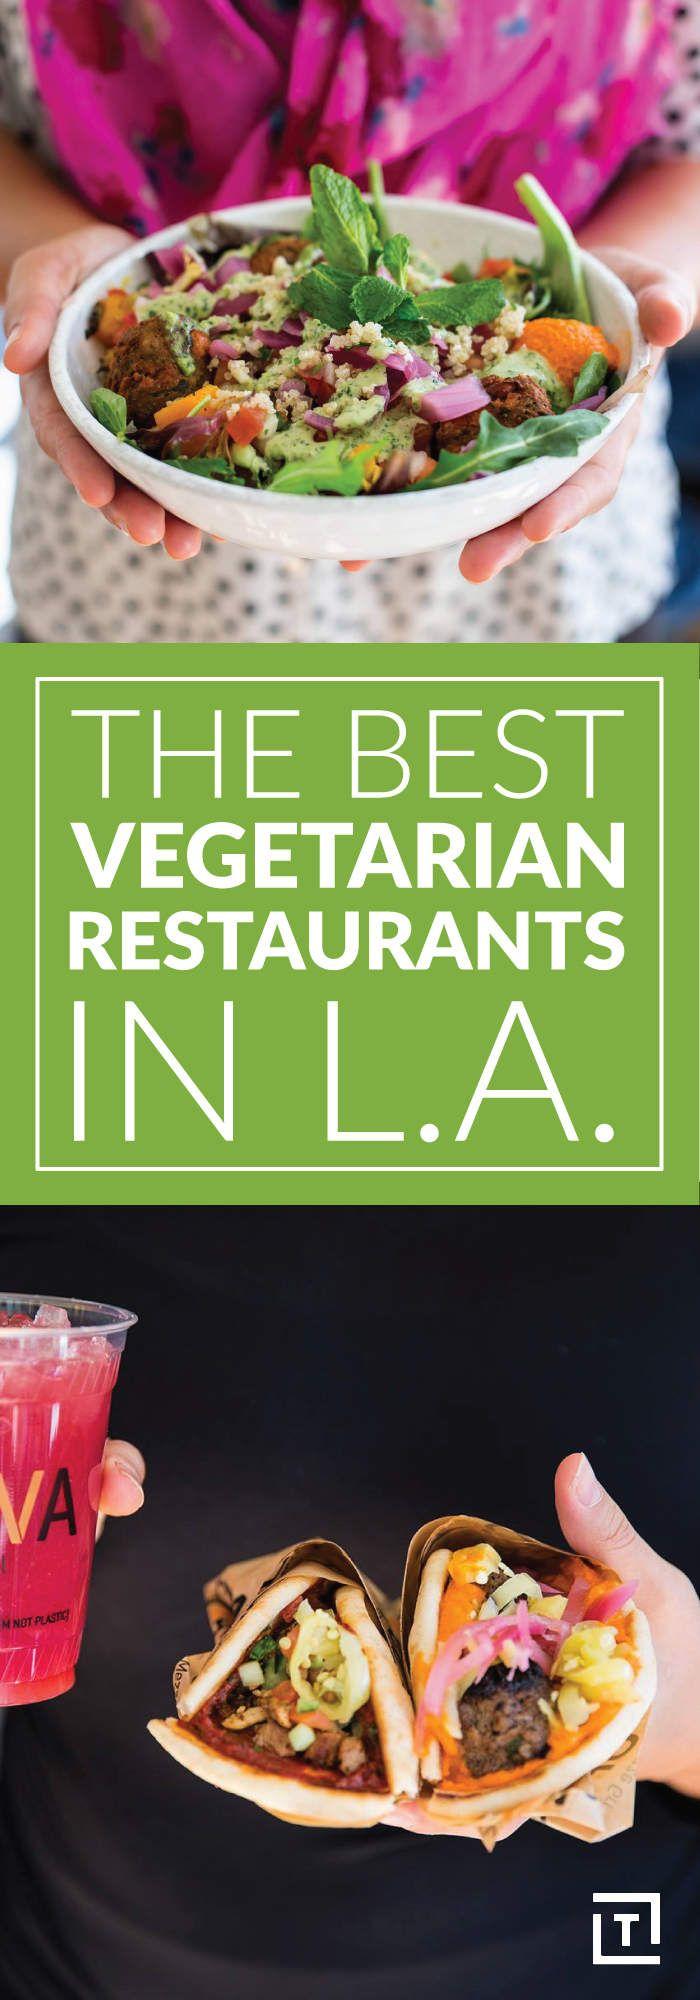 Best Vegetarian & Vegan Restaurants in Los Angeles, California - Thrillist